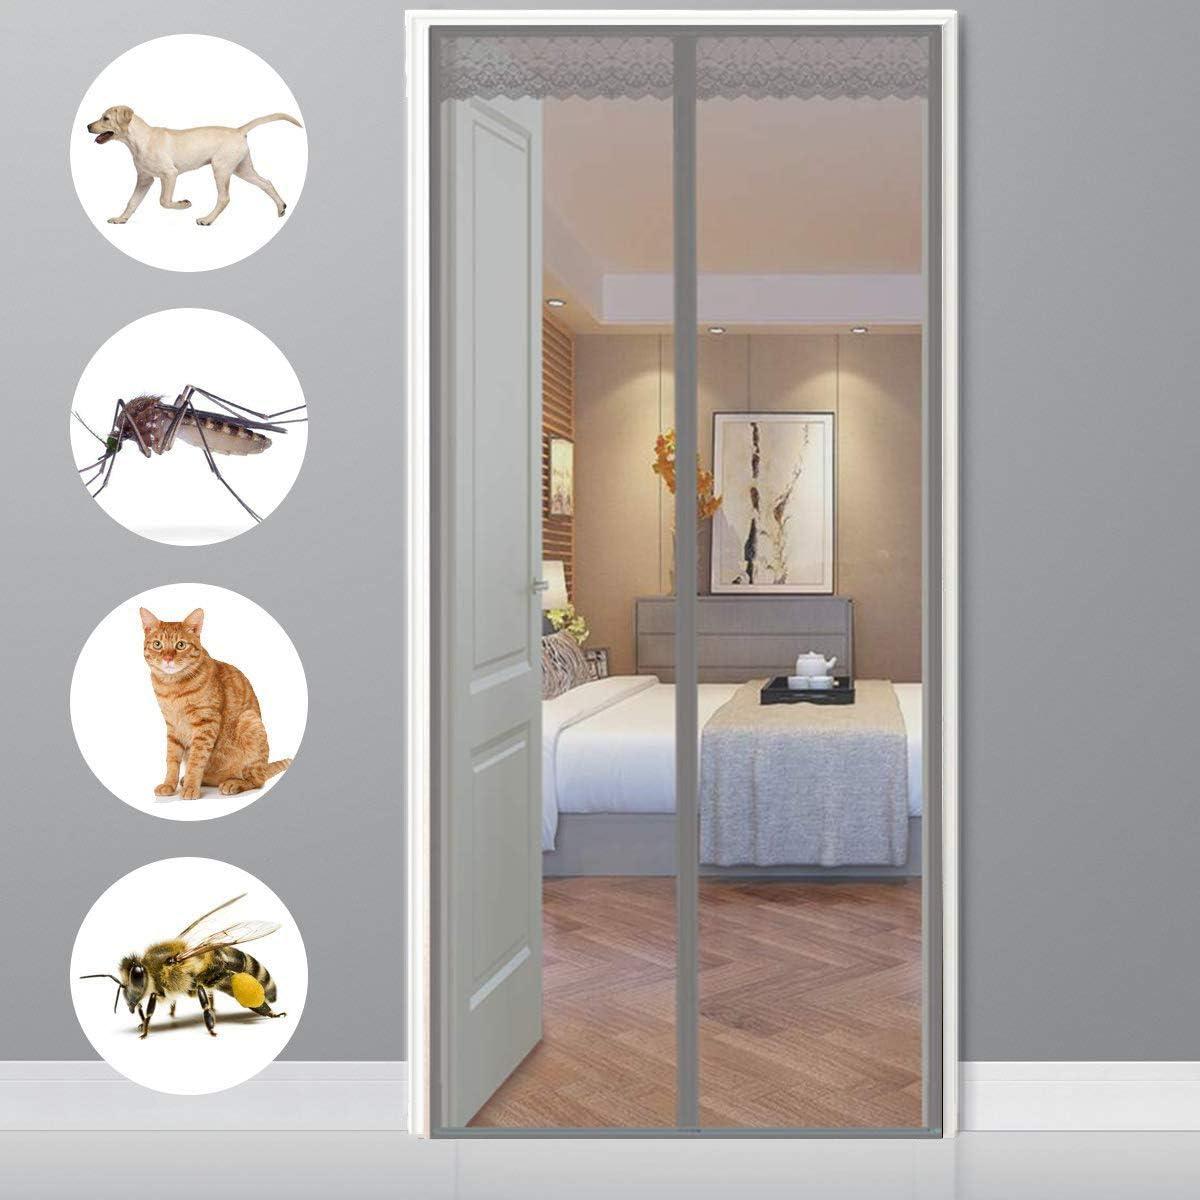 CHENG Mosquiteras imantadas 70x200cm, Pantalla MagnéTica, Adsorción magnética Plegable Fácil de Instalar, para Pasillos/Puertas/Ventanas - Gris: Amazon.es: Hogar